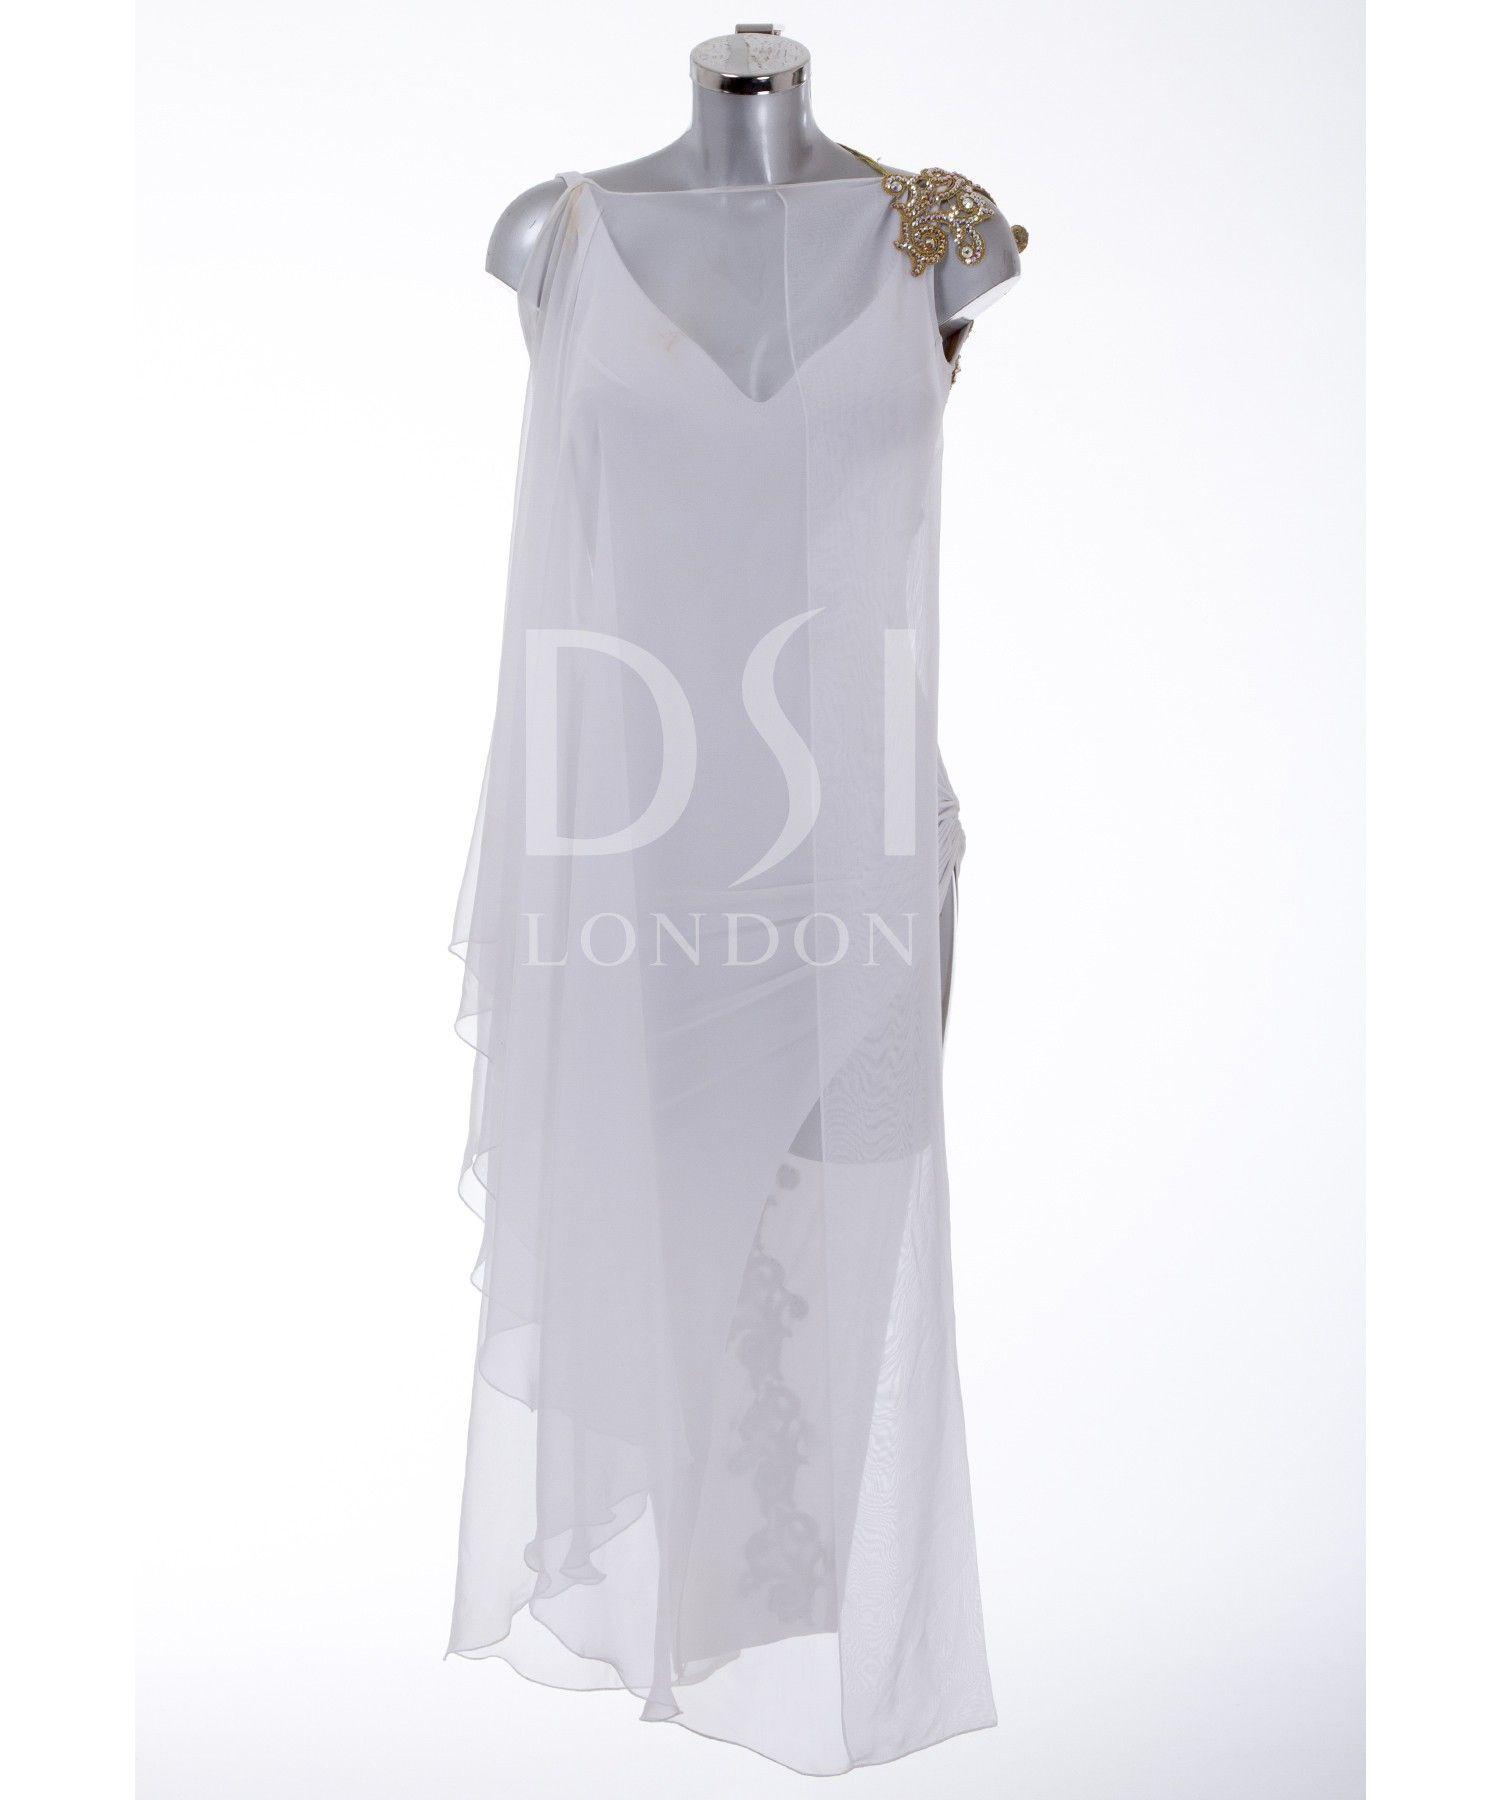 395907 White Latin Dress | Latin dresses for sale | Dance ...